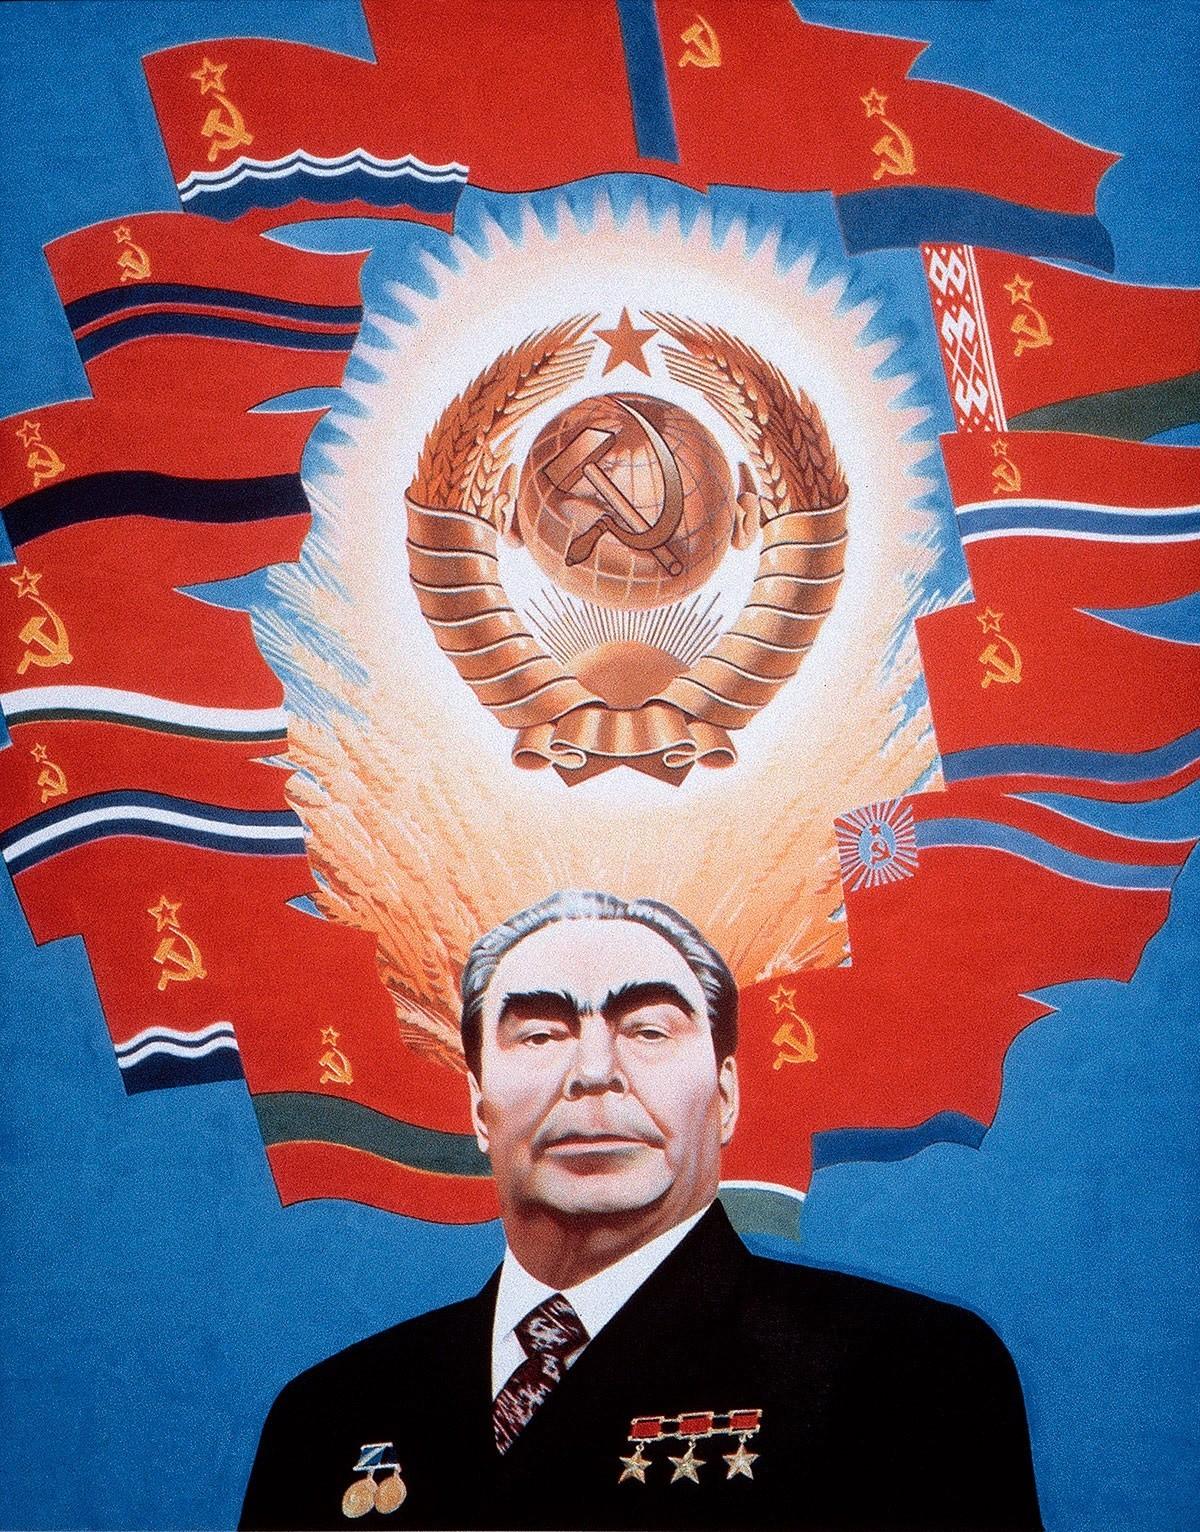 Eric Bulatov. Brežnjev. Sovjetski svemir, 1977.